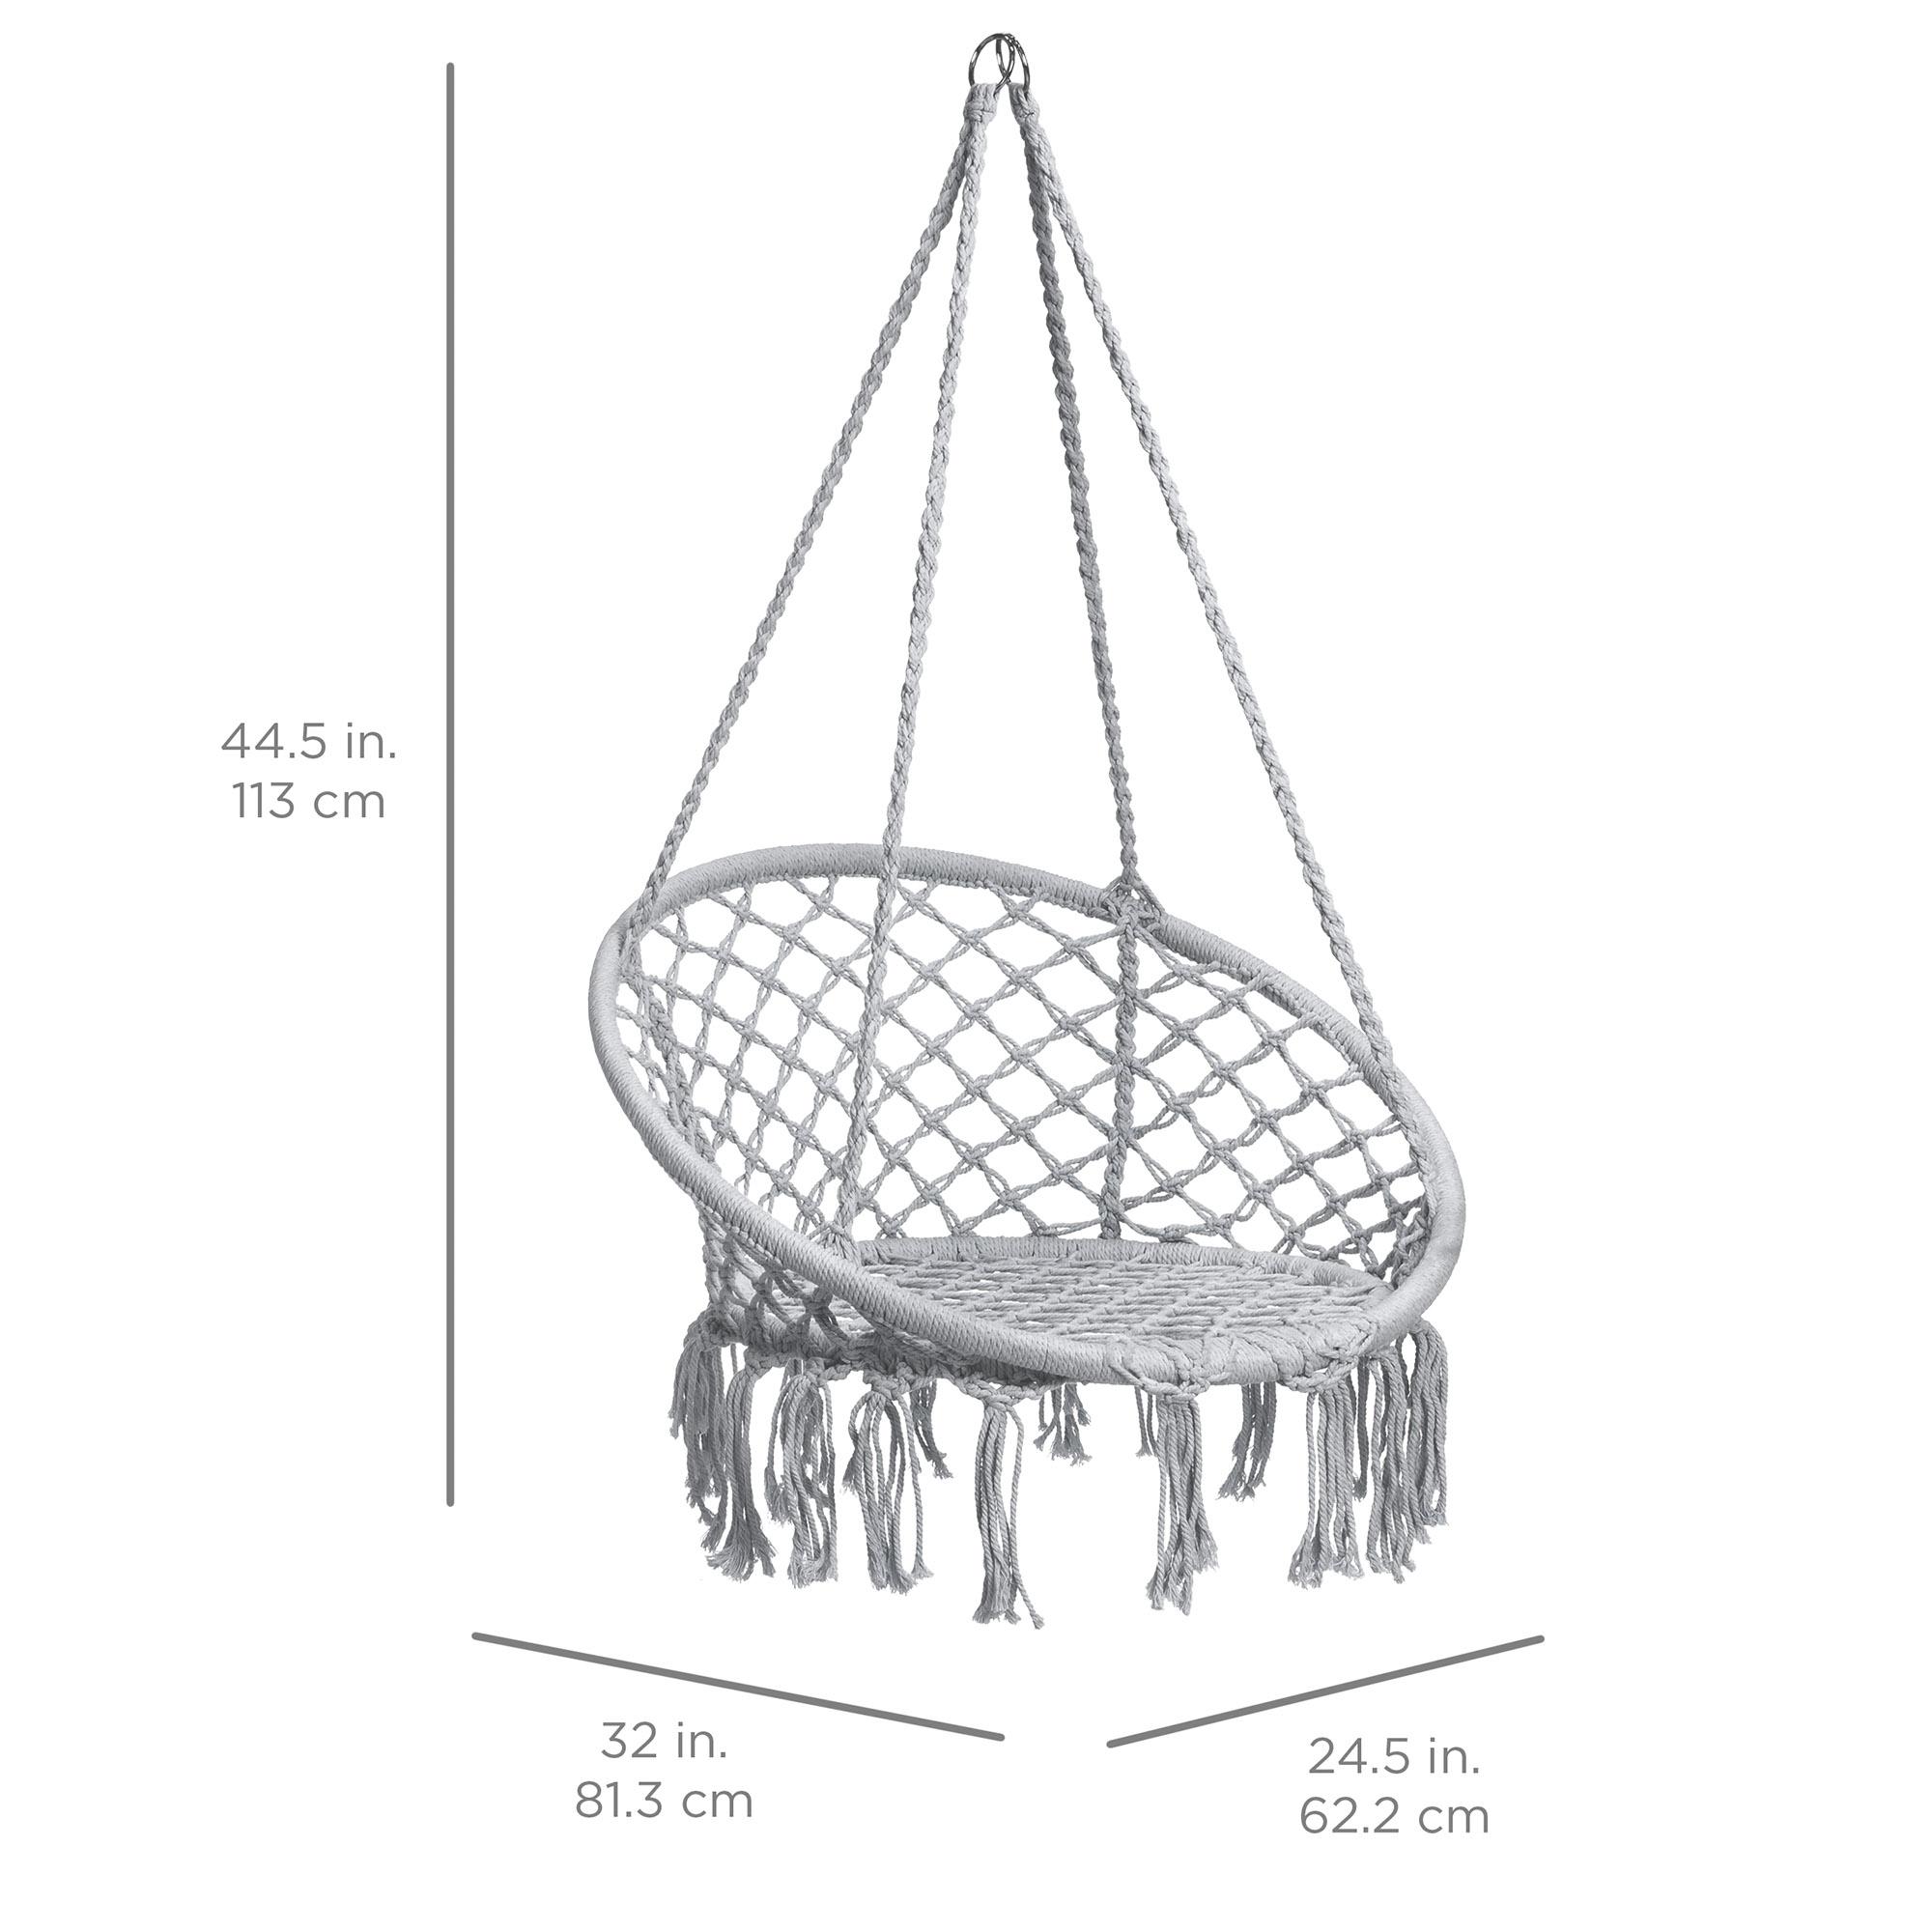 BCP-Handwoven-Cotton-Macrame-Hammock-Hanging-Chair-Swing-w-Backrest thumbnail 28